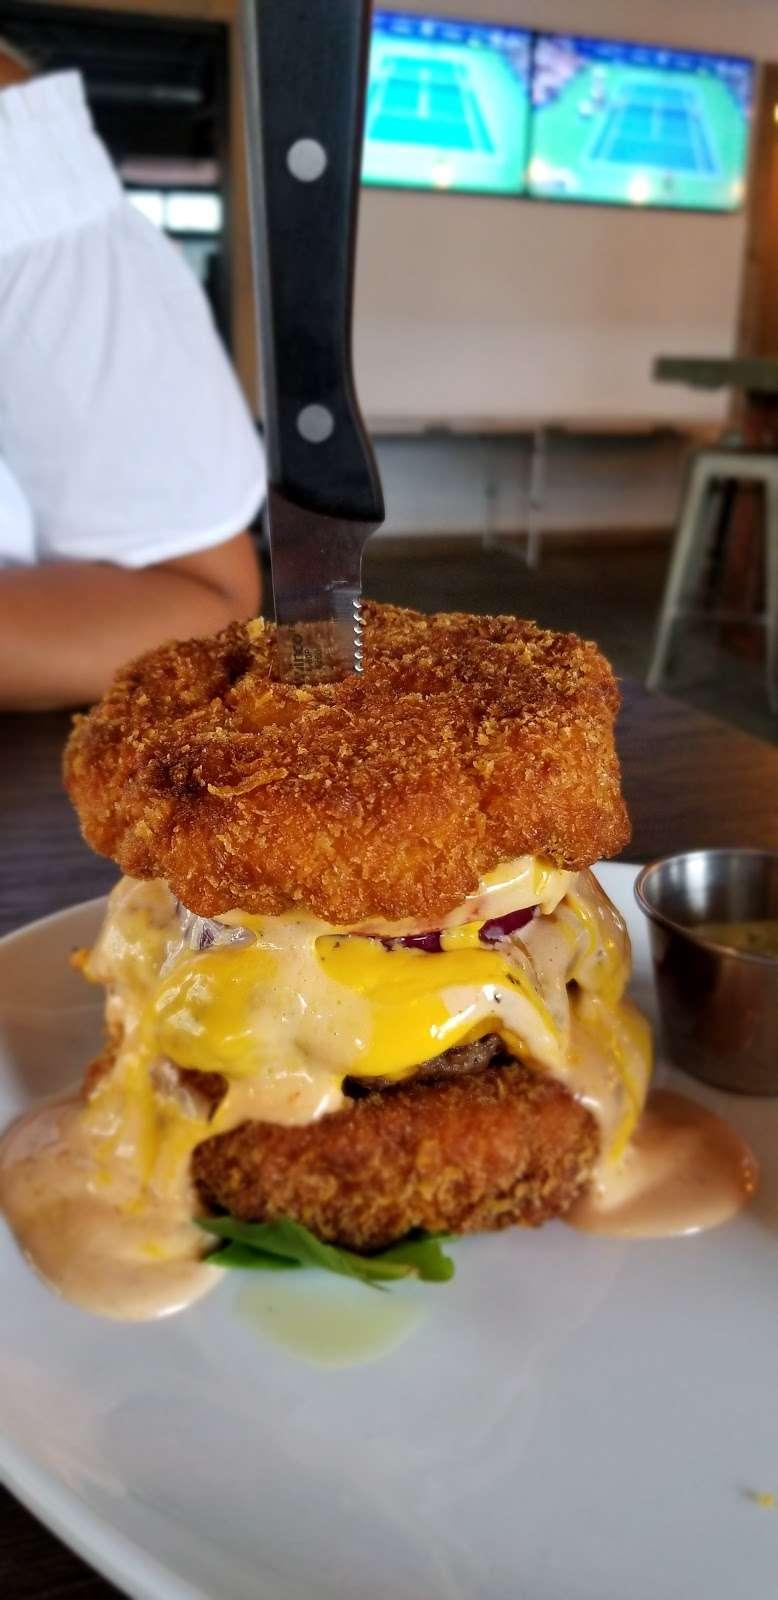 Bronx Tavern - restaurant  | Photo 10 of 10 | Address: 3503, 780 E 133rd St, Bronx, NY 10454, USA | Phone: (718) 292-2108